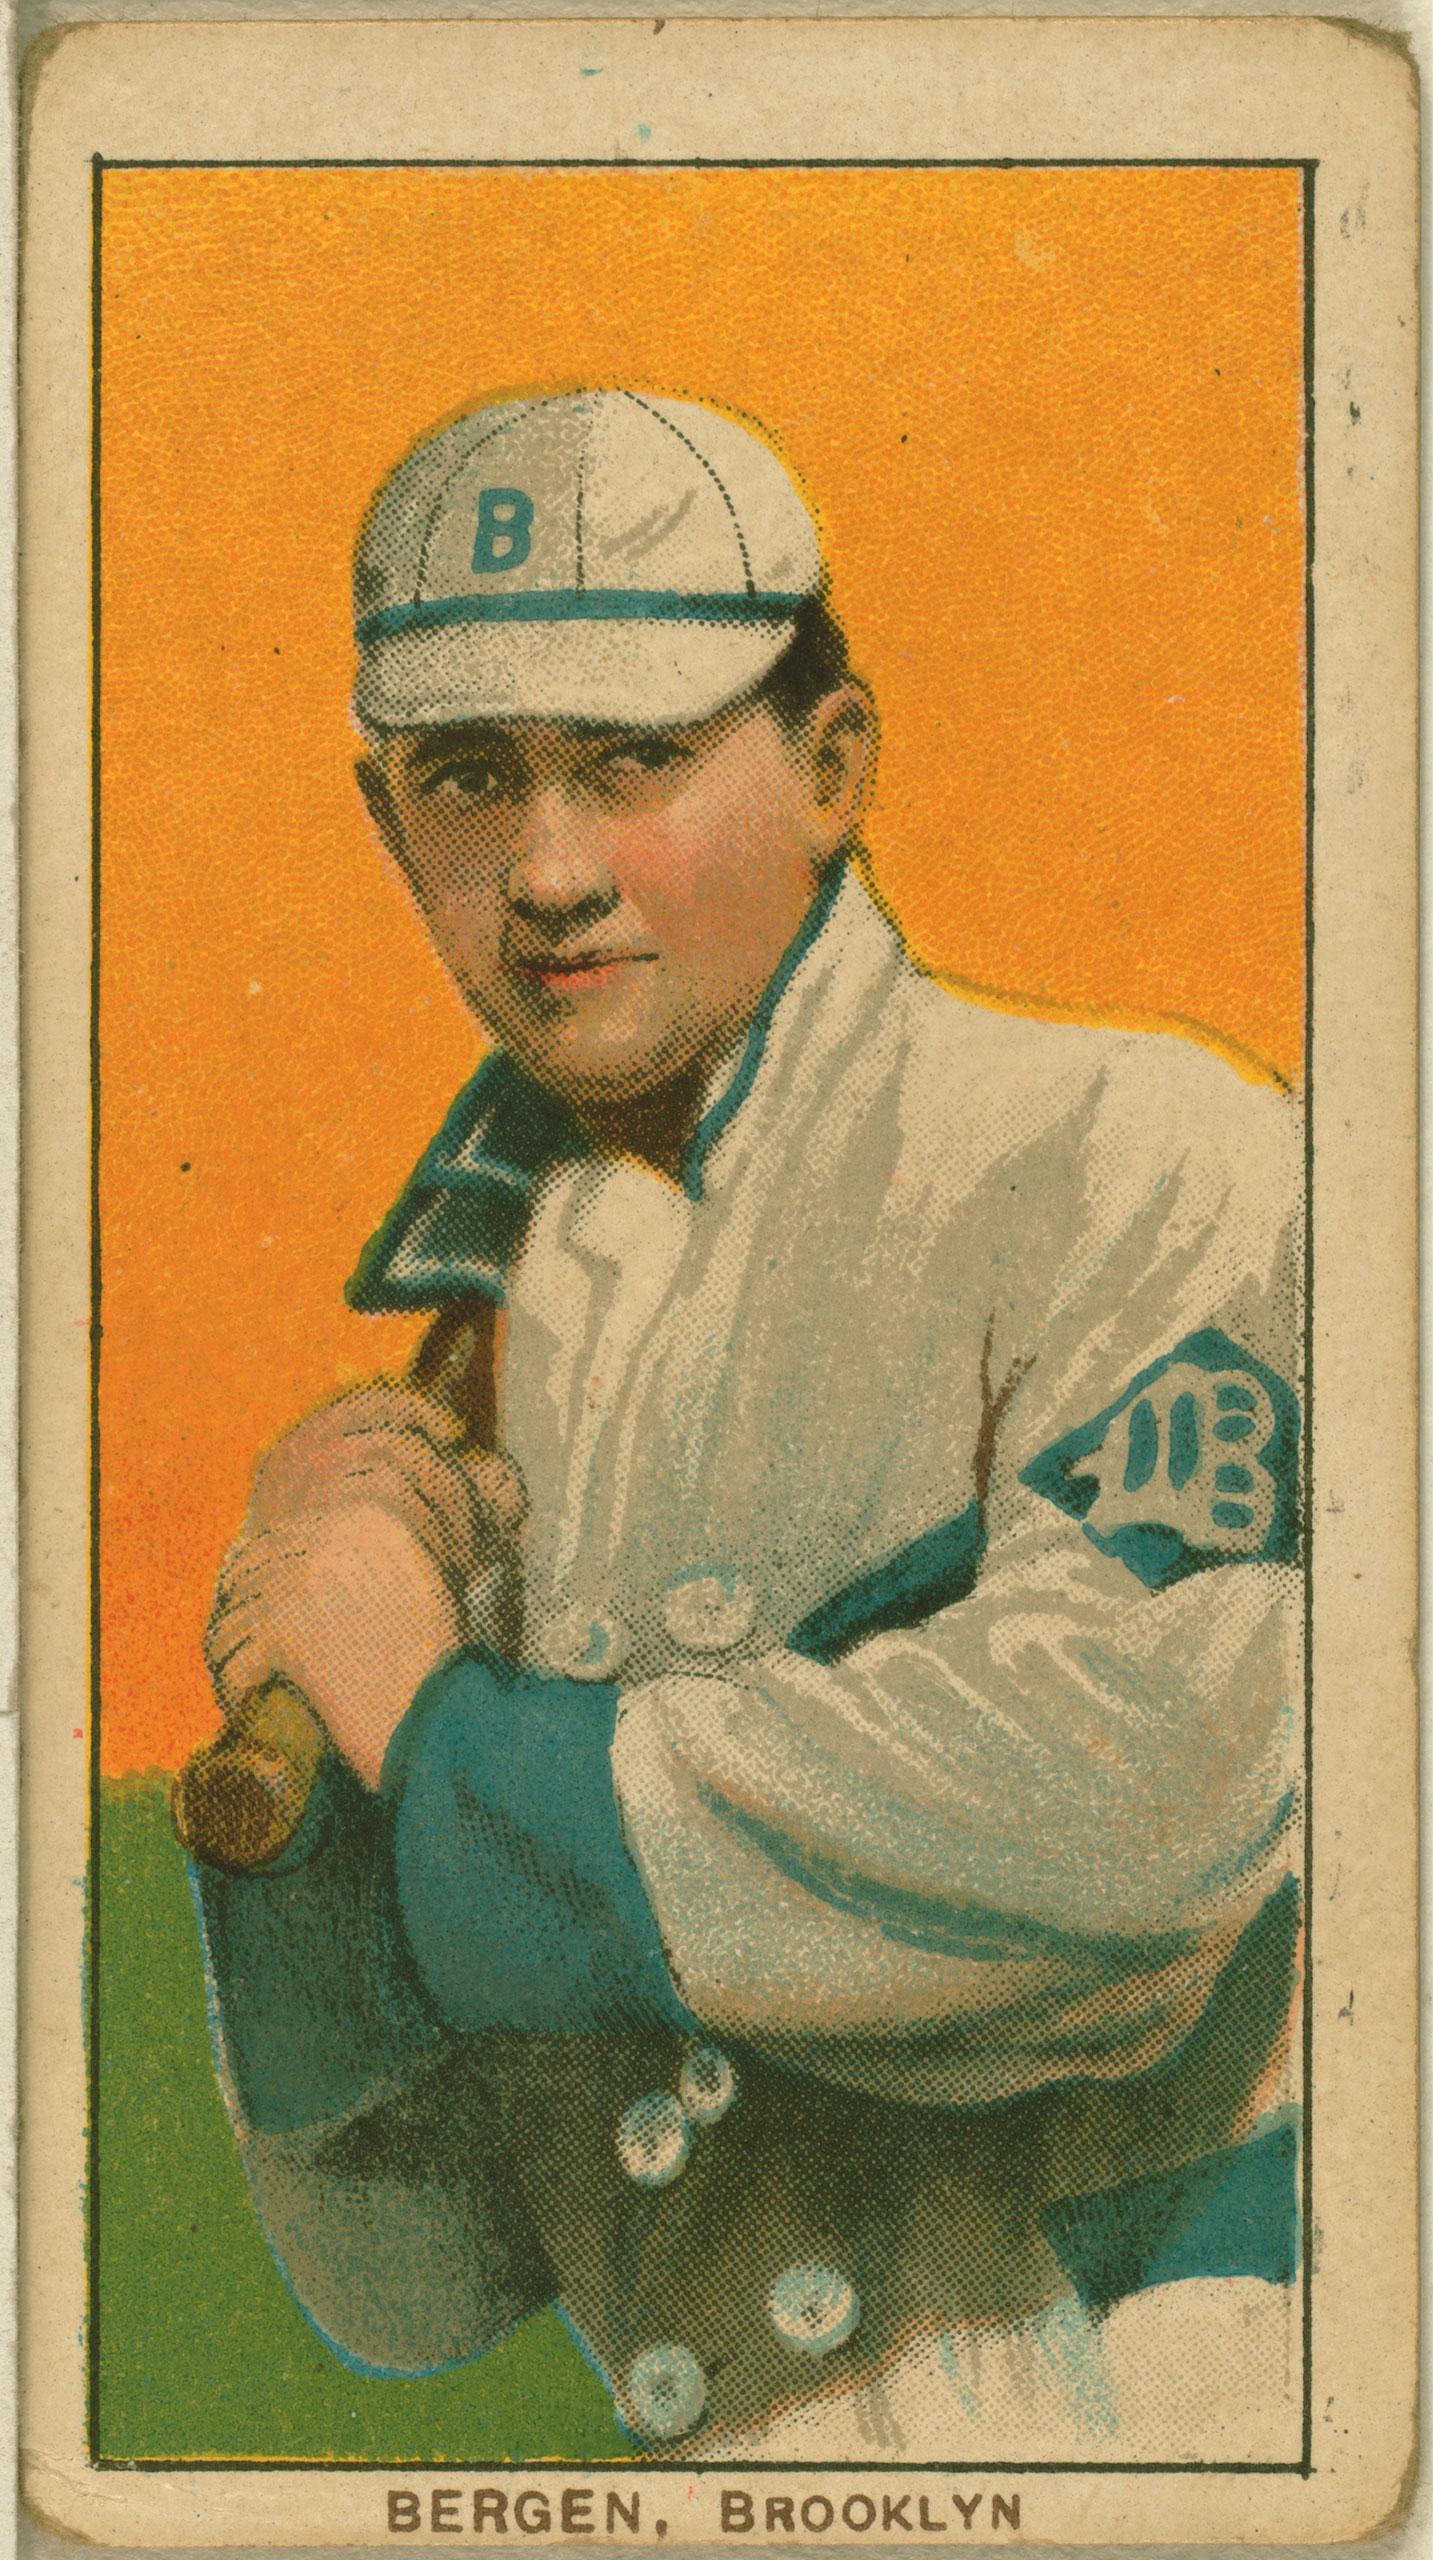 Bill Bergen, Brooklyn Dodgers, baseball card, 1909-1911.